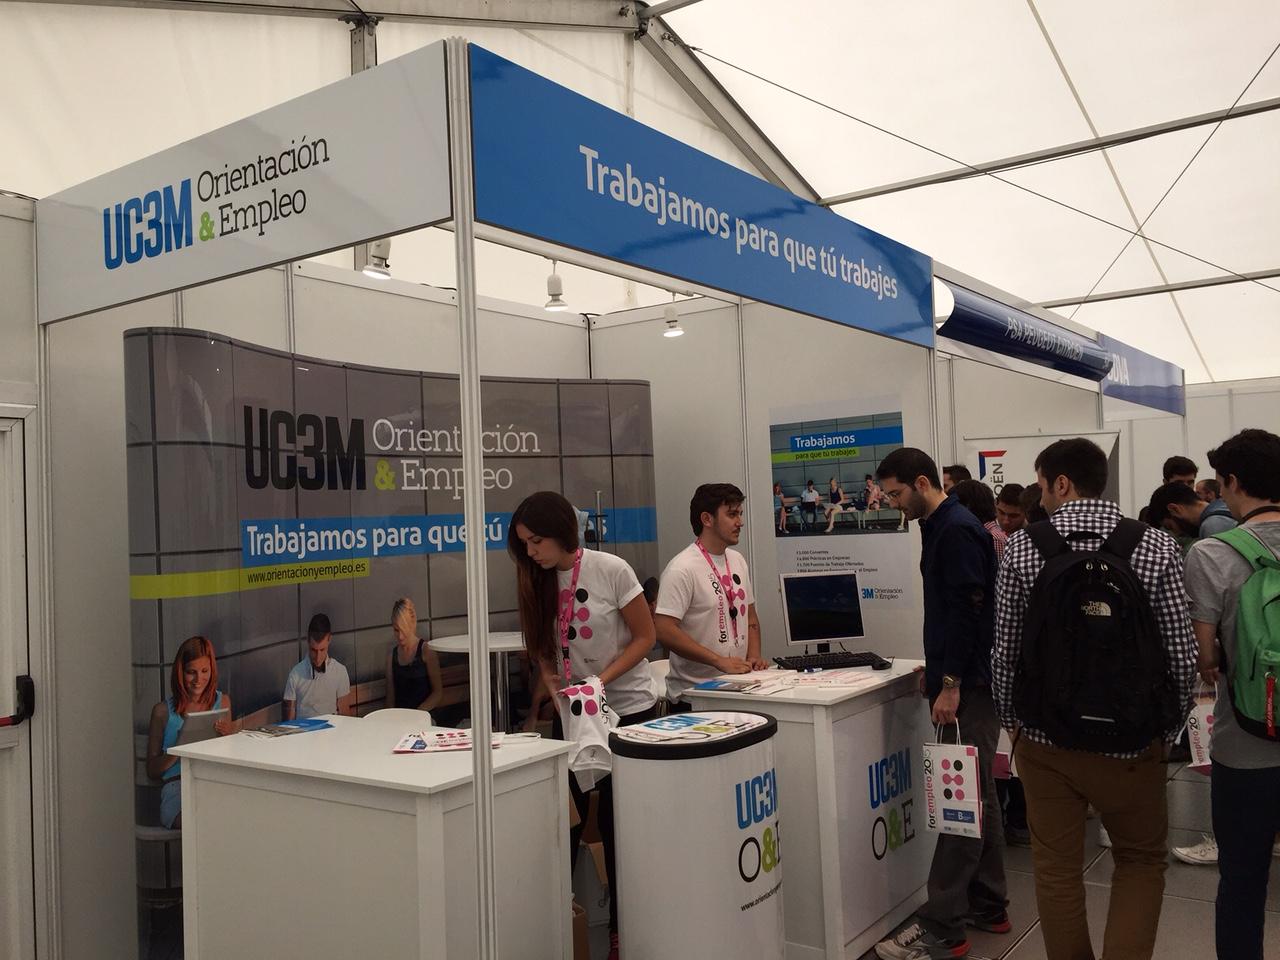 Agencia para el empleo de madrid forempleo 2016 for Agencia de empleo madrid